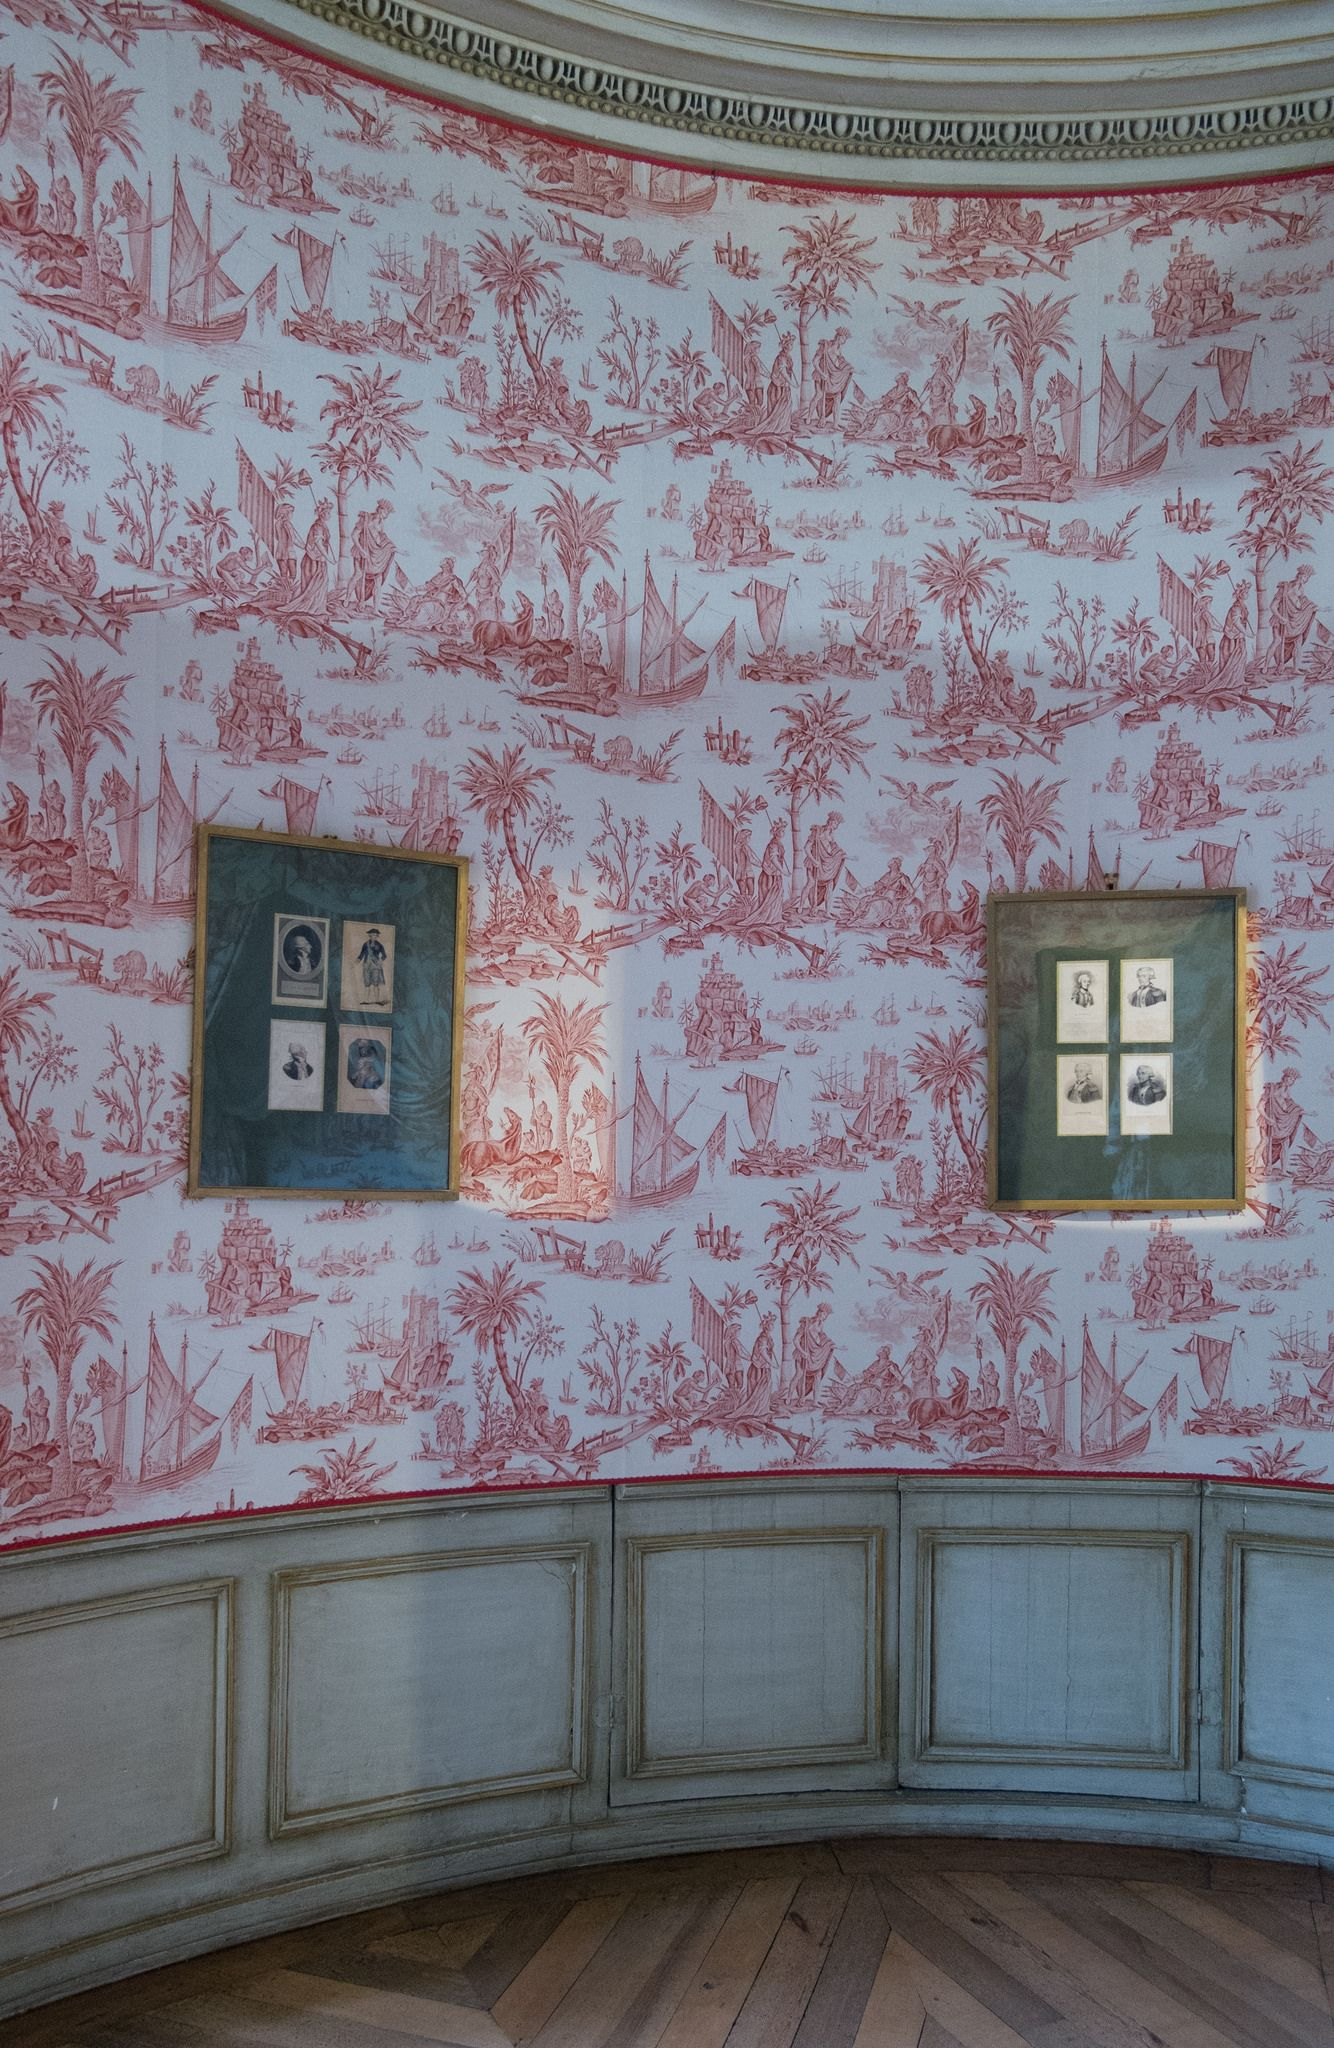 Chateau Lafayette Chavaniac Lafayette Haute Loire France Red Toile New Orleans Decor Wallpaper